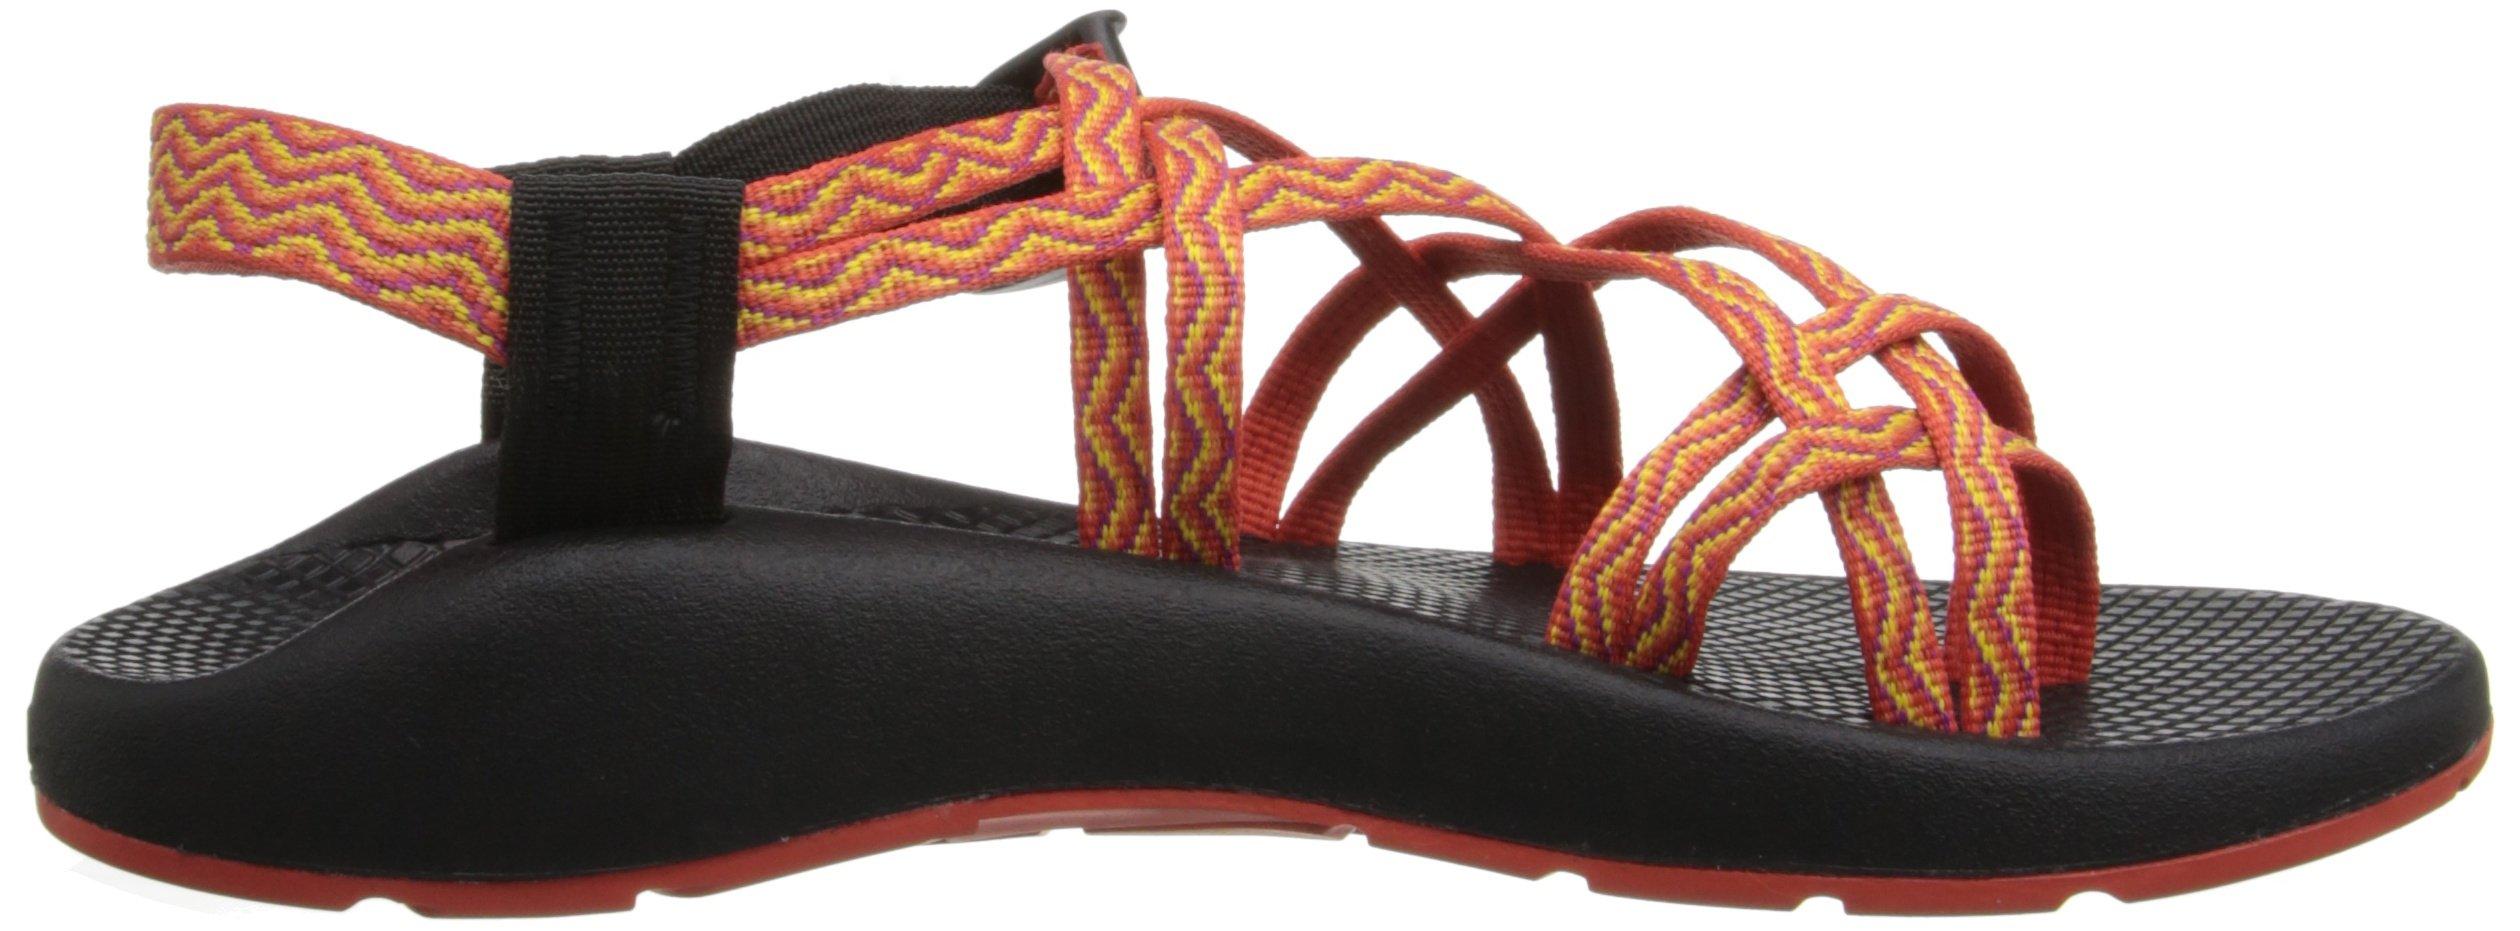 Chaco Women's ZX/2 Yampa Sandal,Rainbow,6 B US by Chaco (Image #6)